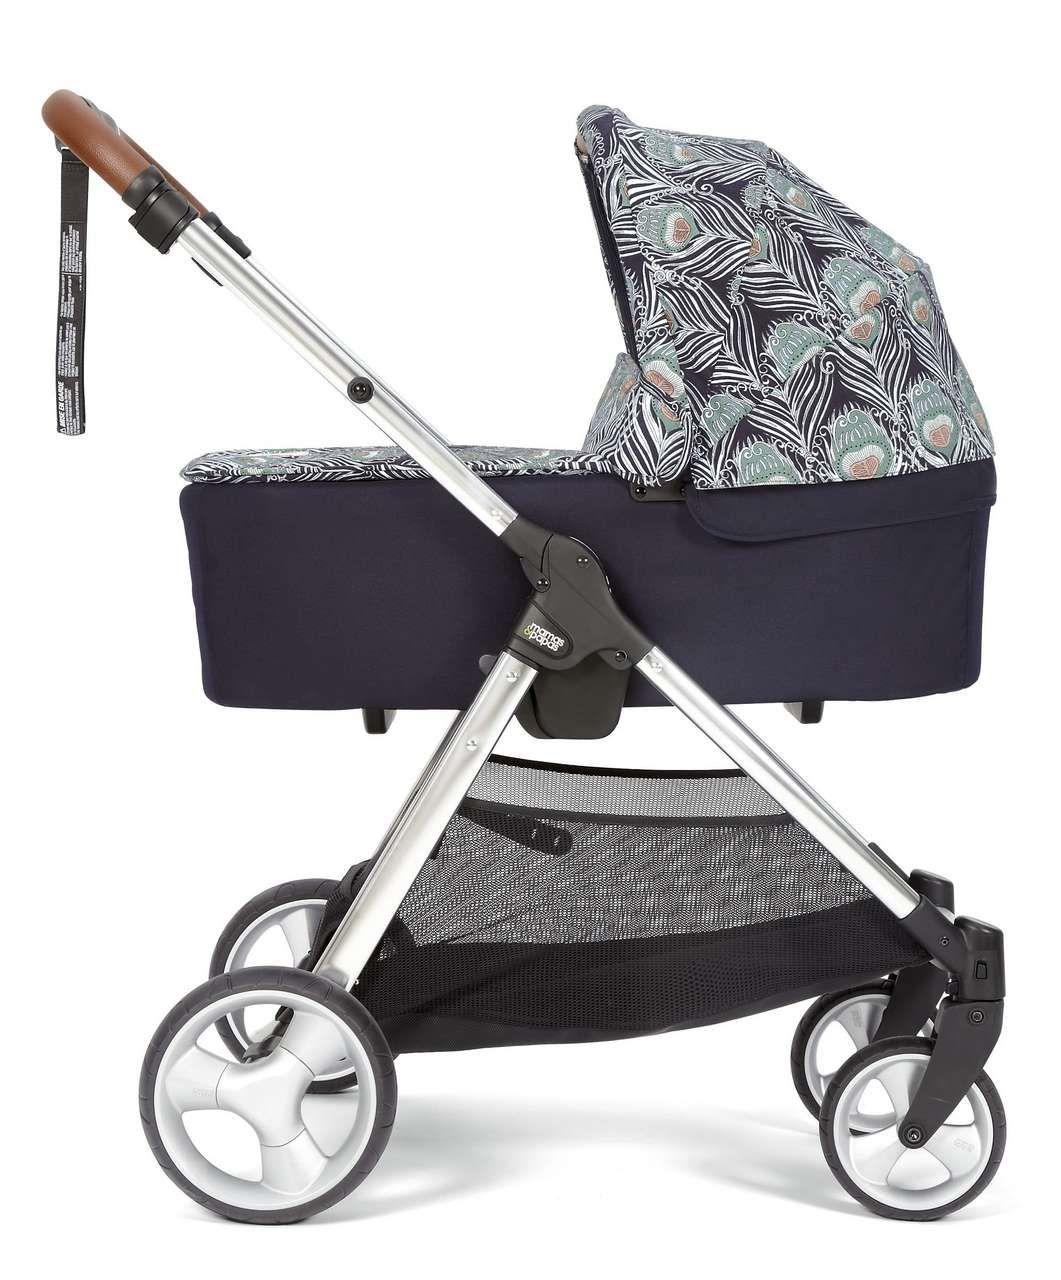 ec6bebfcd74e0 Special Edition Liberty Collaboration Armadillo Flip & Flip XT Carrycot -  Liberty Travel - Mamas & Papas